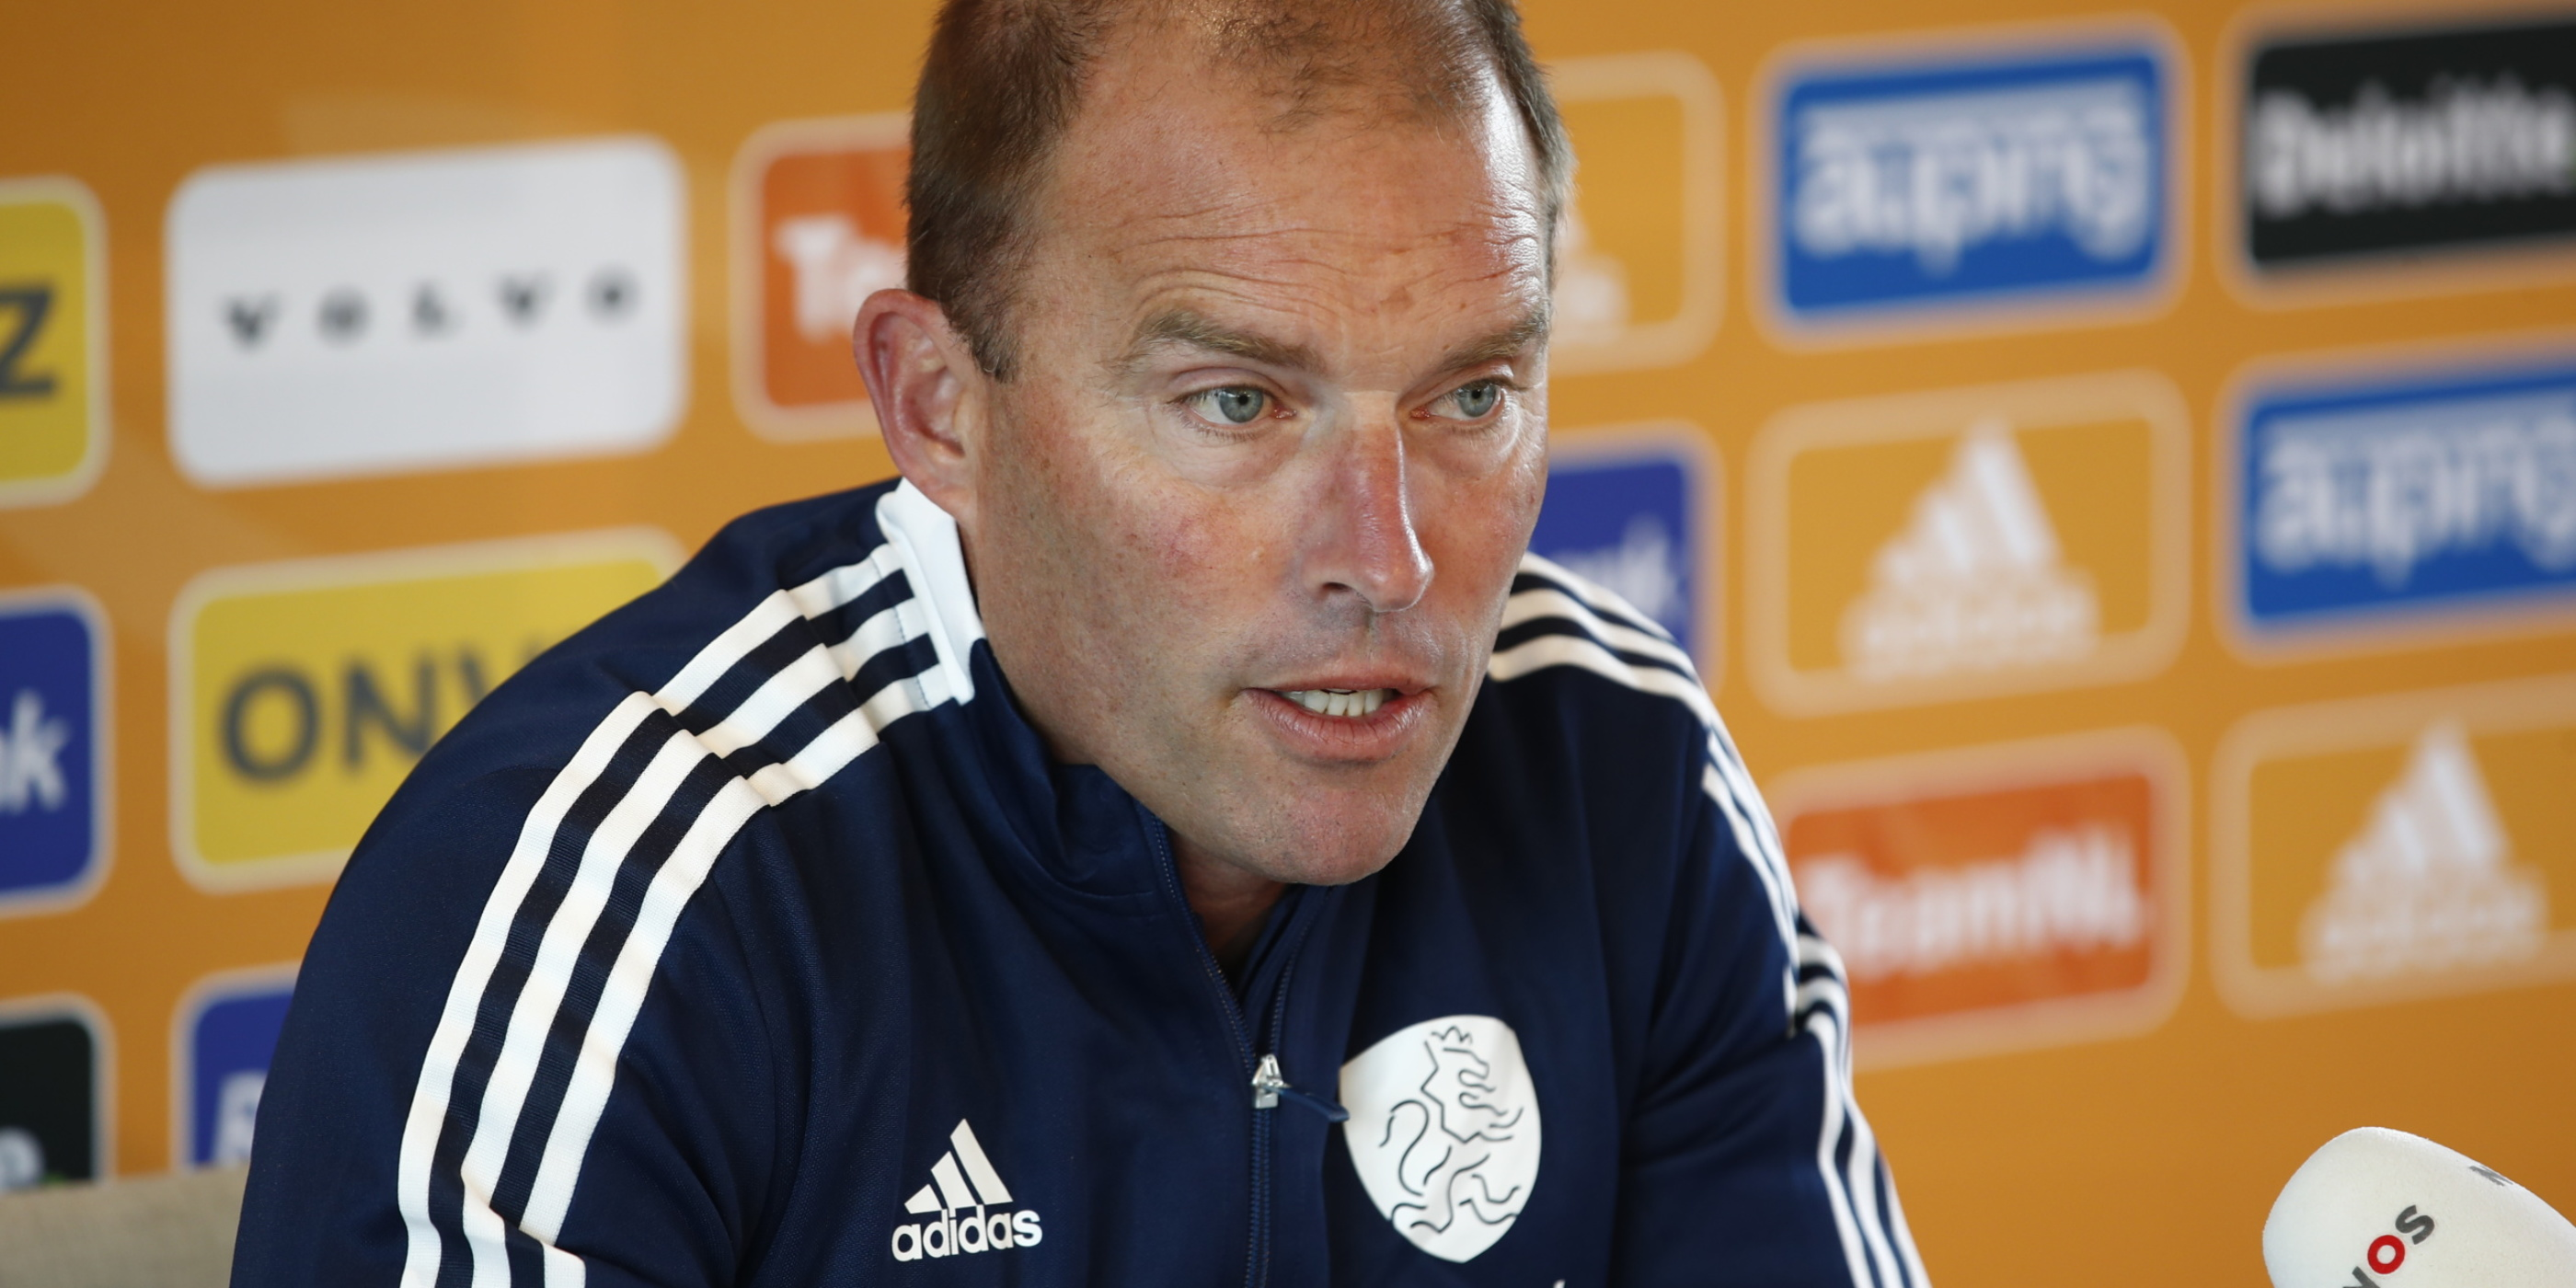 Bondscoach Delmee maakt trainingsgroep Oranje bekend